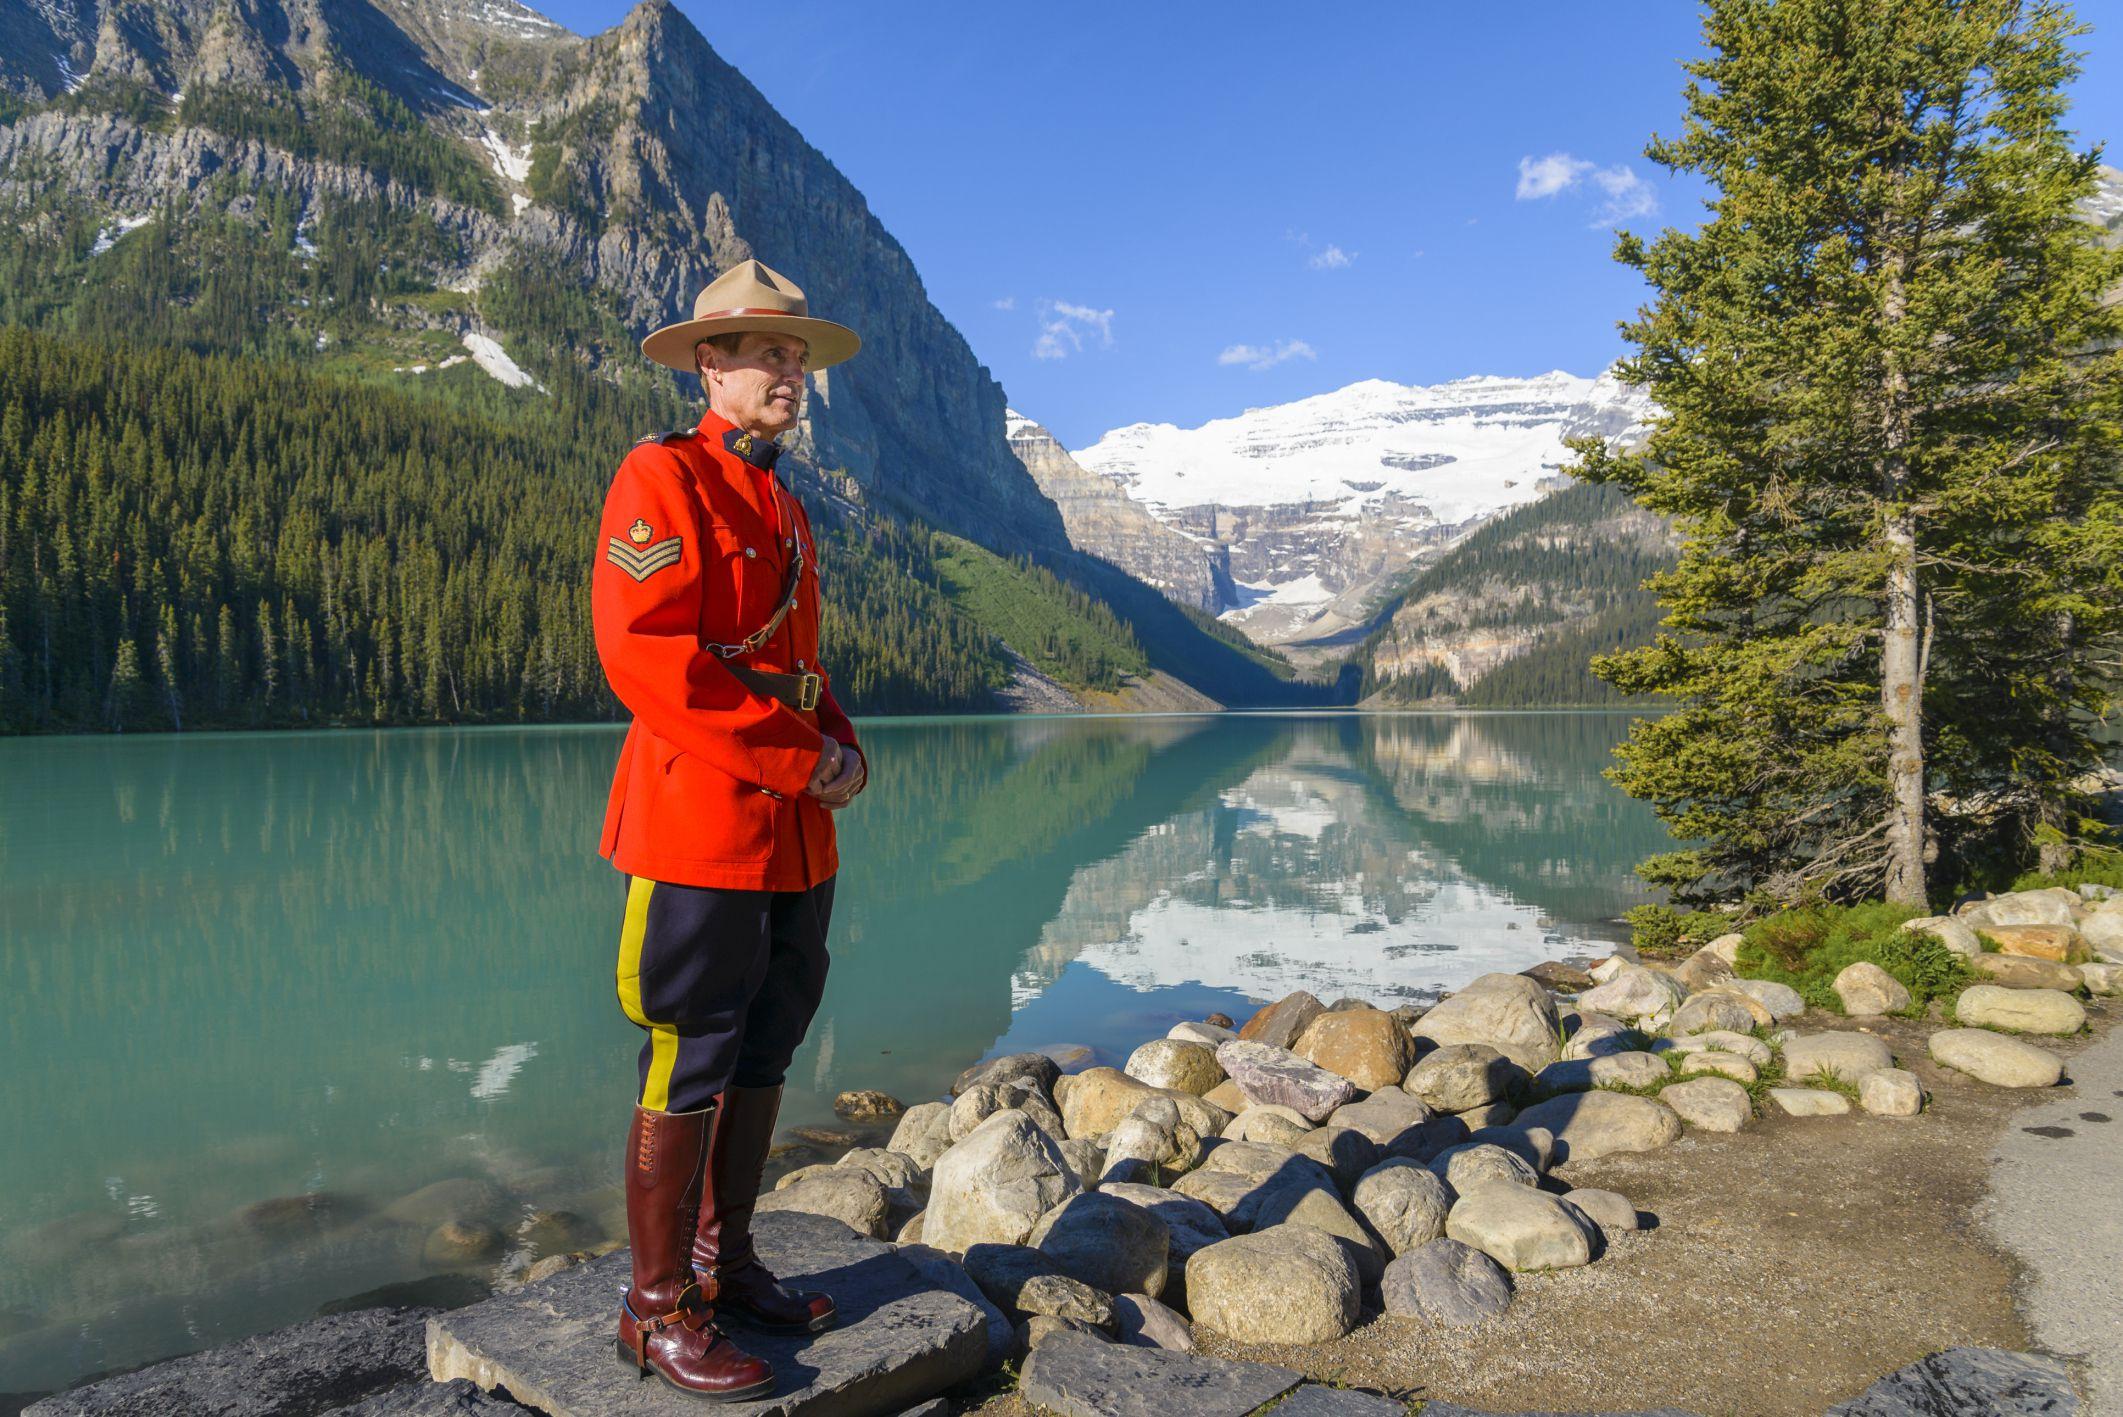 Royal Canadian Mounted Police Job Information